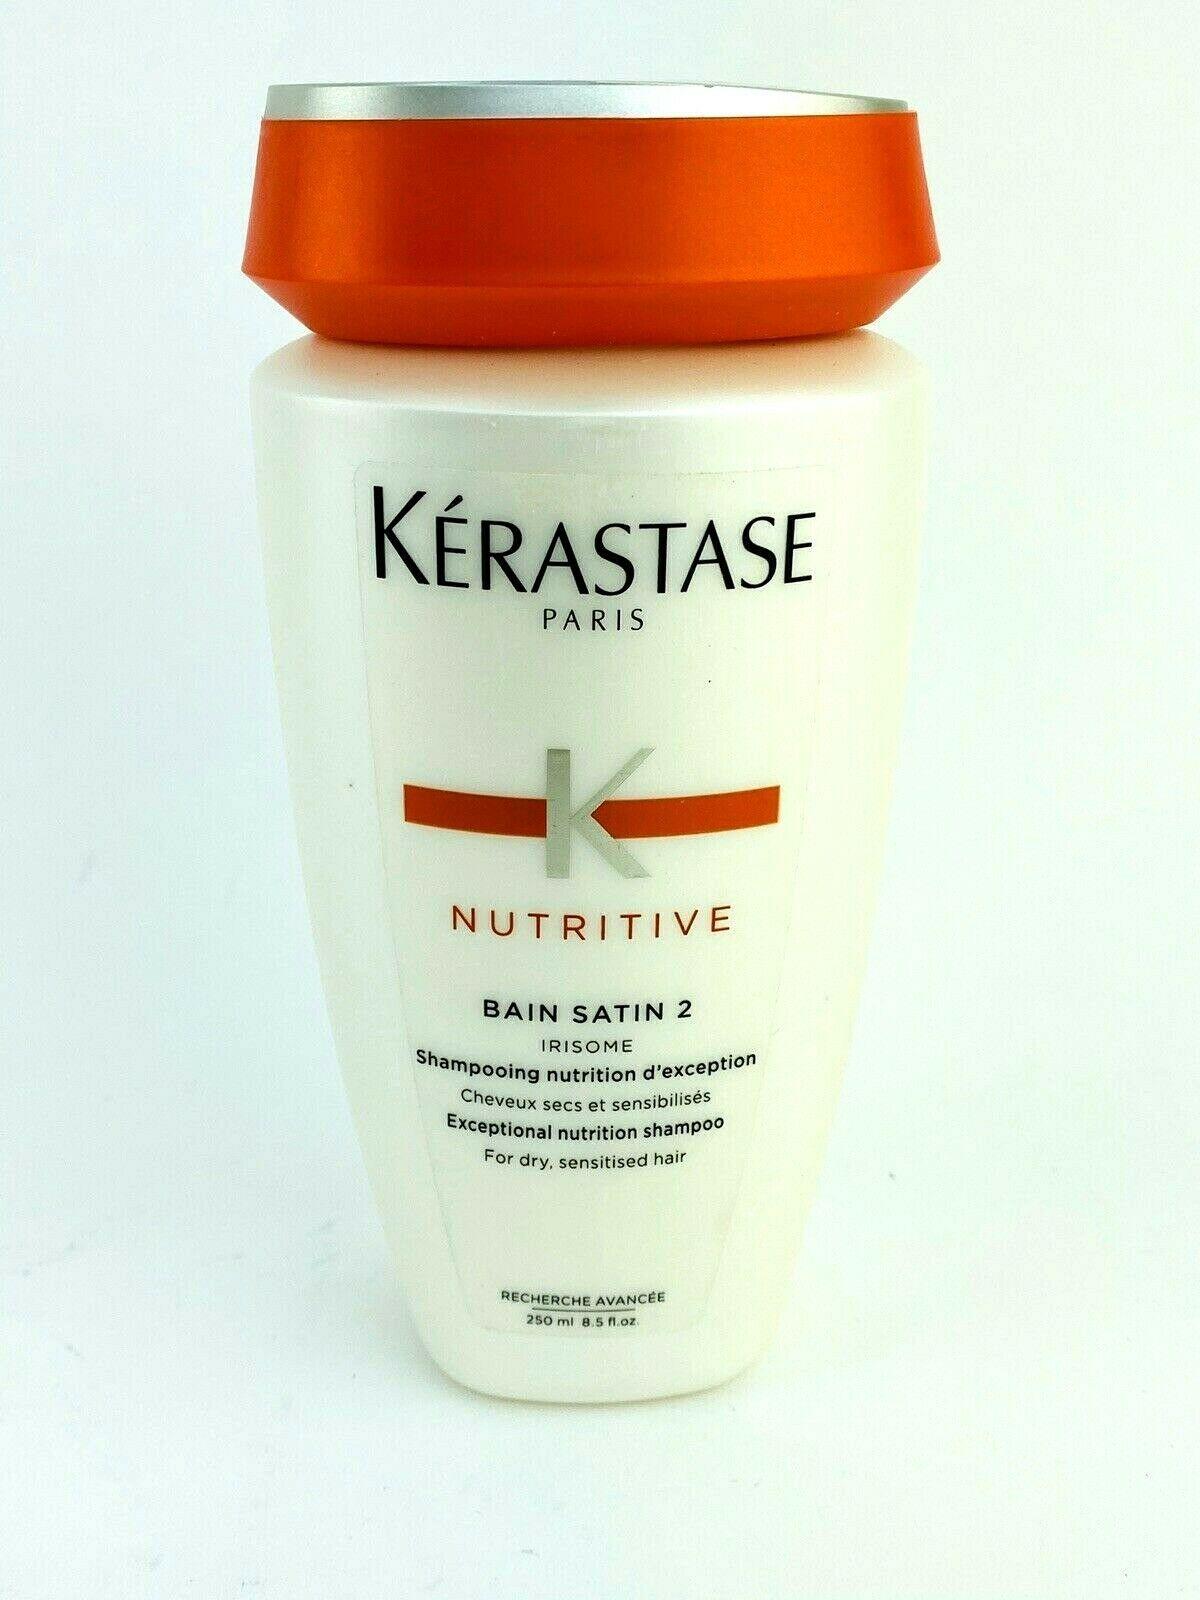 Kerastase Nutritive Bain Satin 2 Complete Nutrition Shampoo 8.5 Oz Hair Care - $23.70